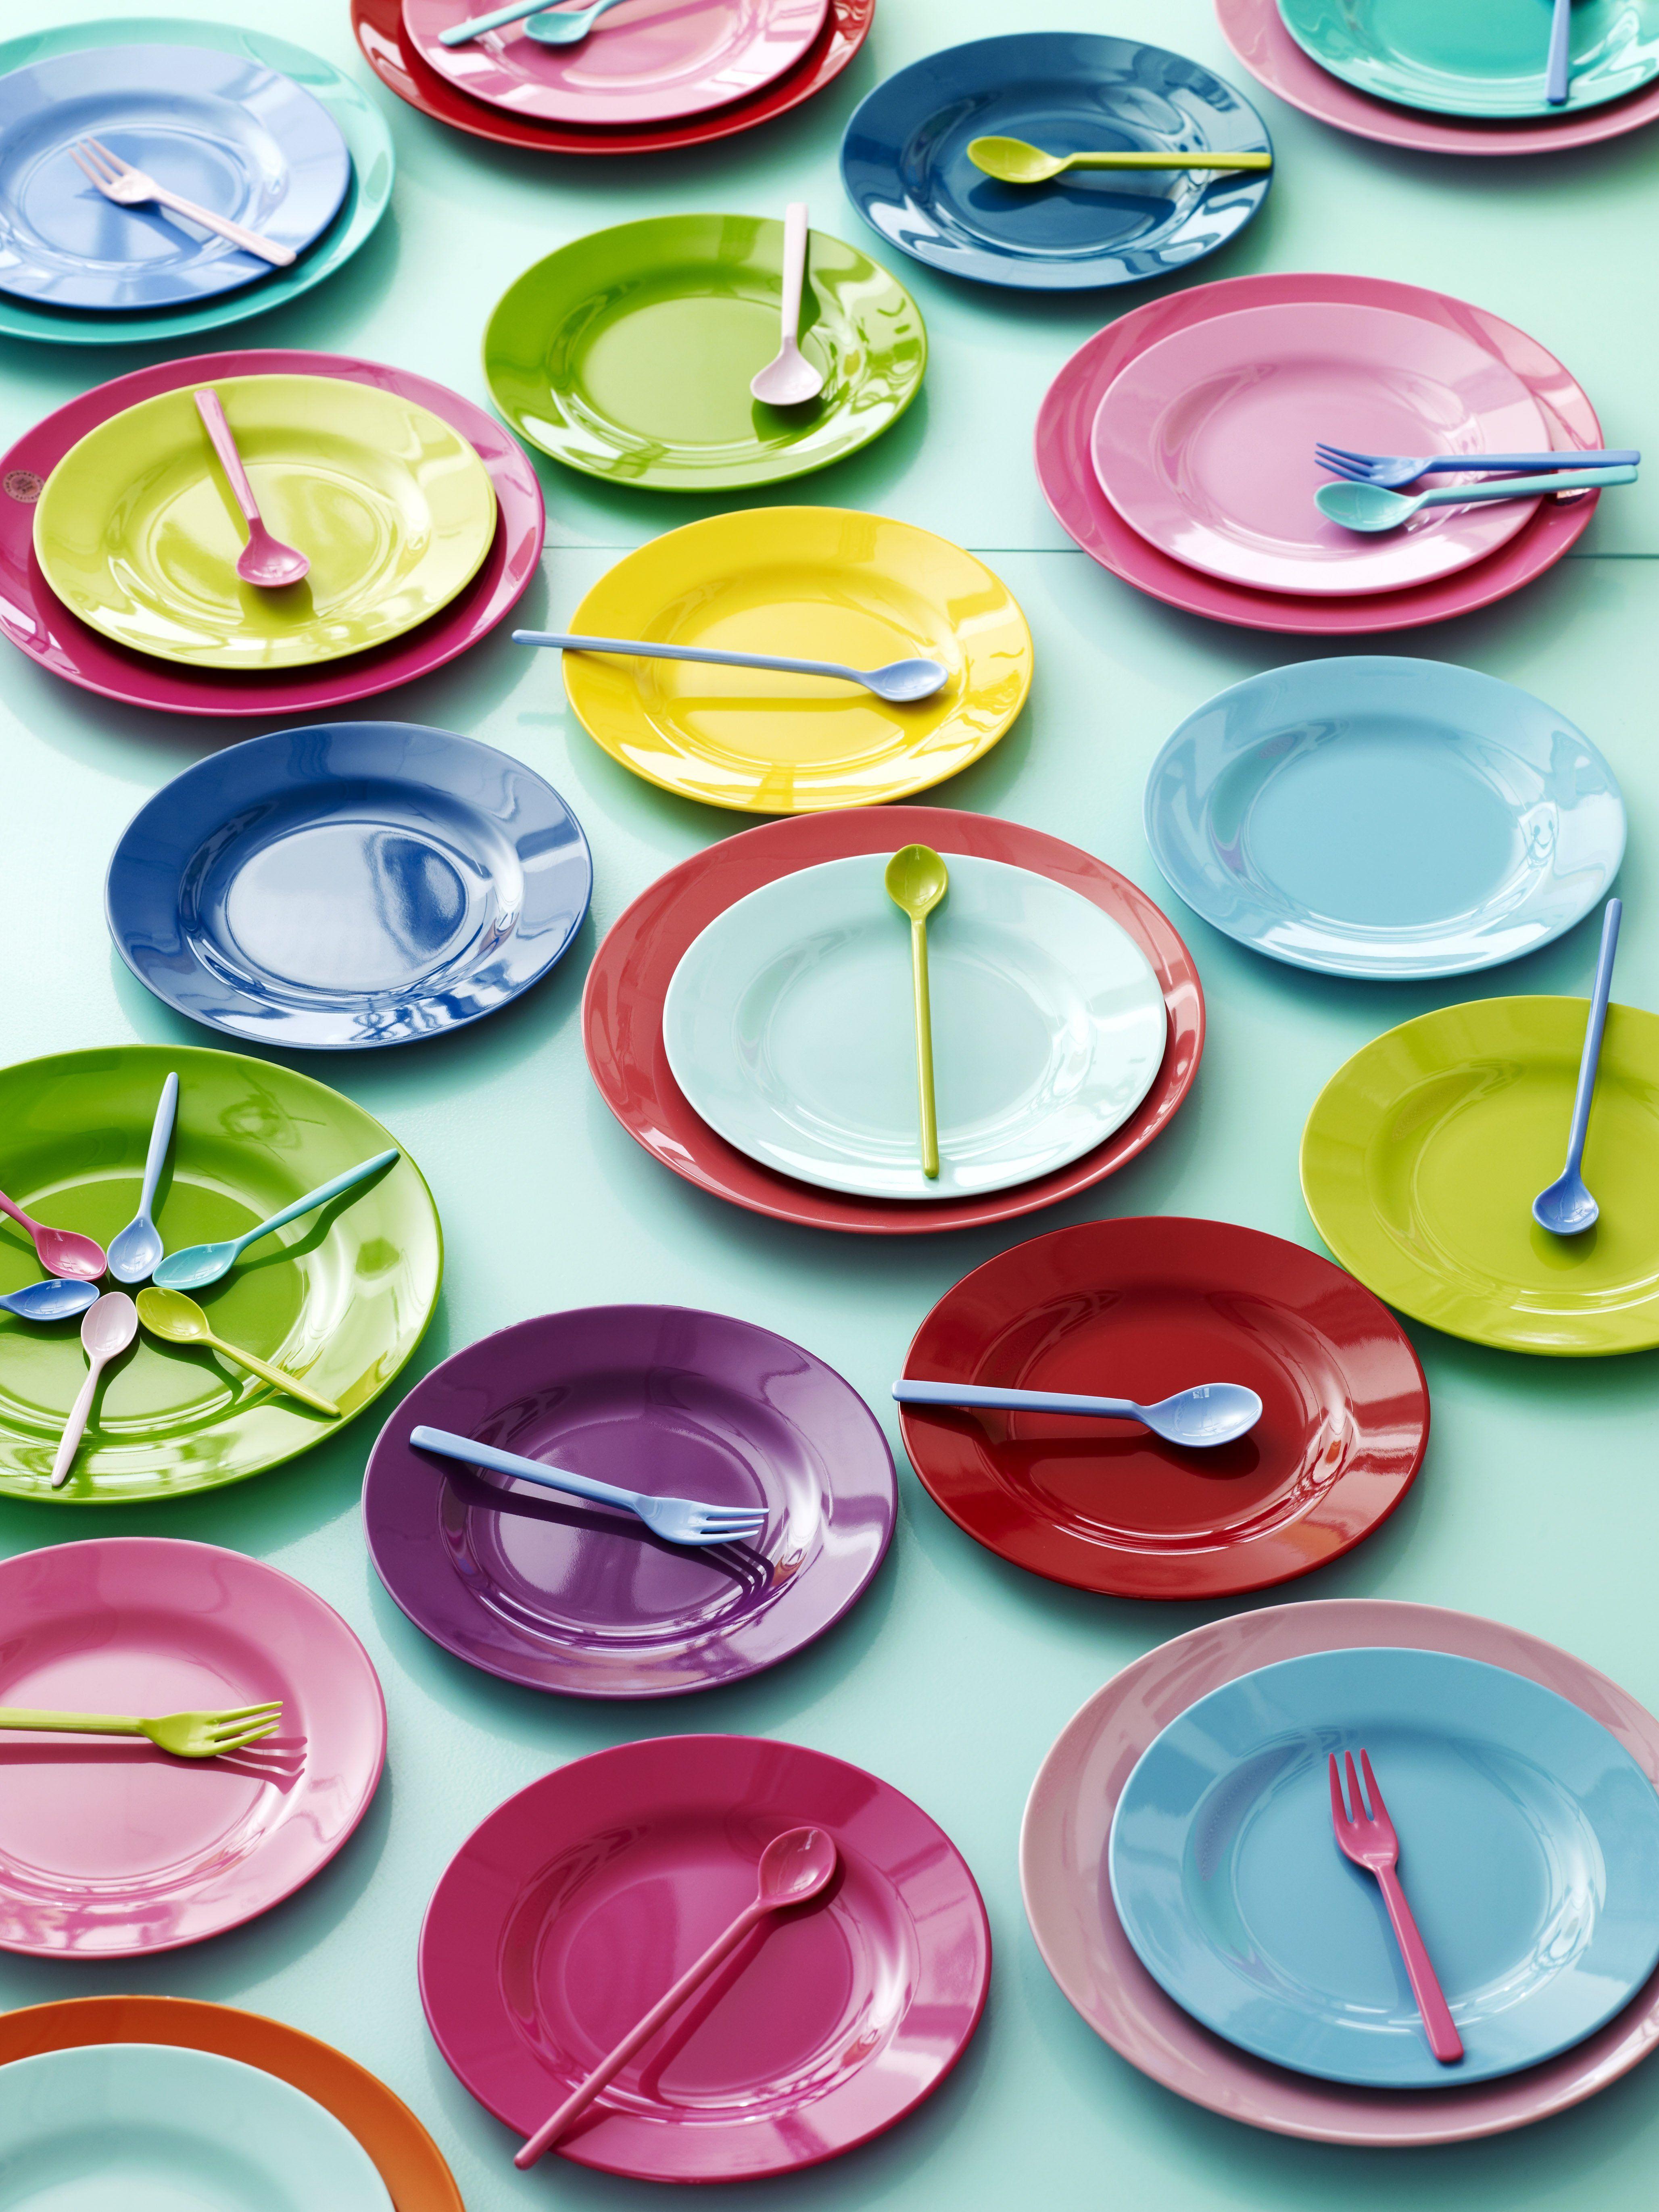 Melamine Plates from RICE vrolijke kleurrijke tafel kinderen kids colorful table  sc 1 st  Pinterest & Rice DK Melamine Side Assorted Plates | Rice Tablewares and Kitchens